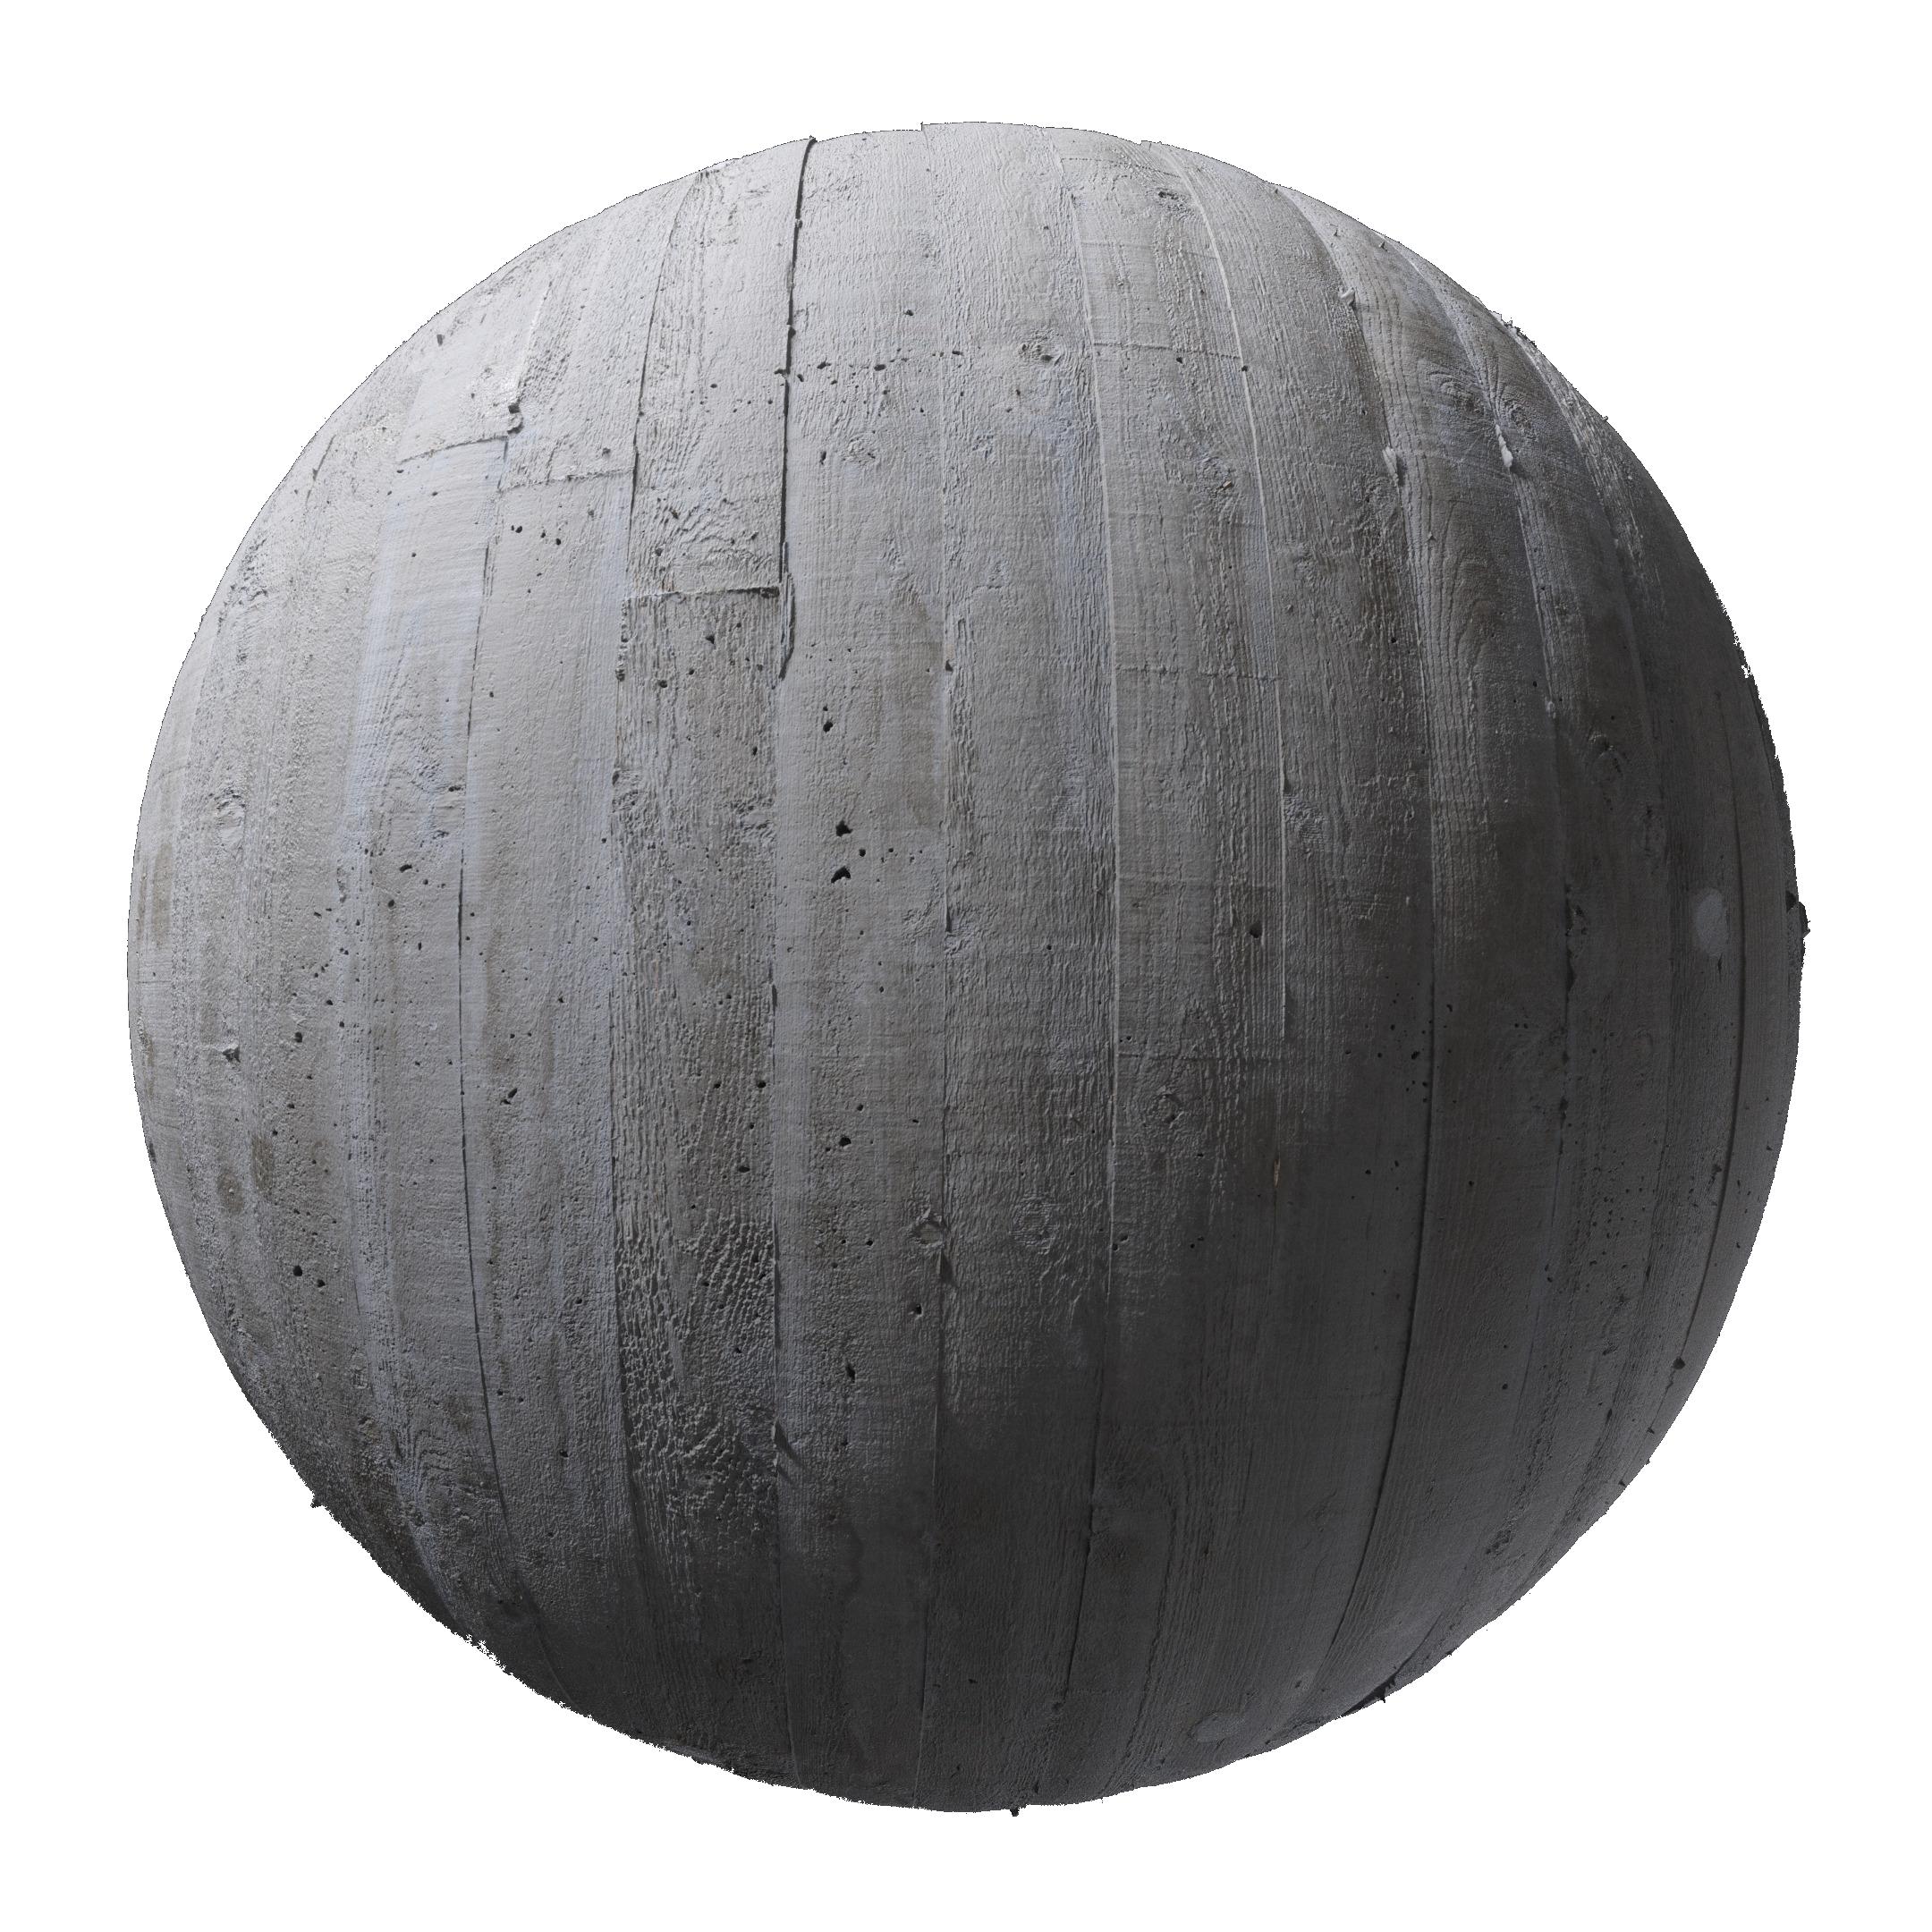 TexturesCom_Bunker_Concrete_header4 copy.png